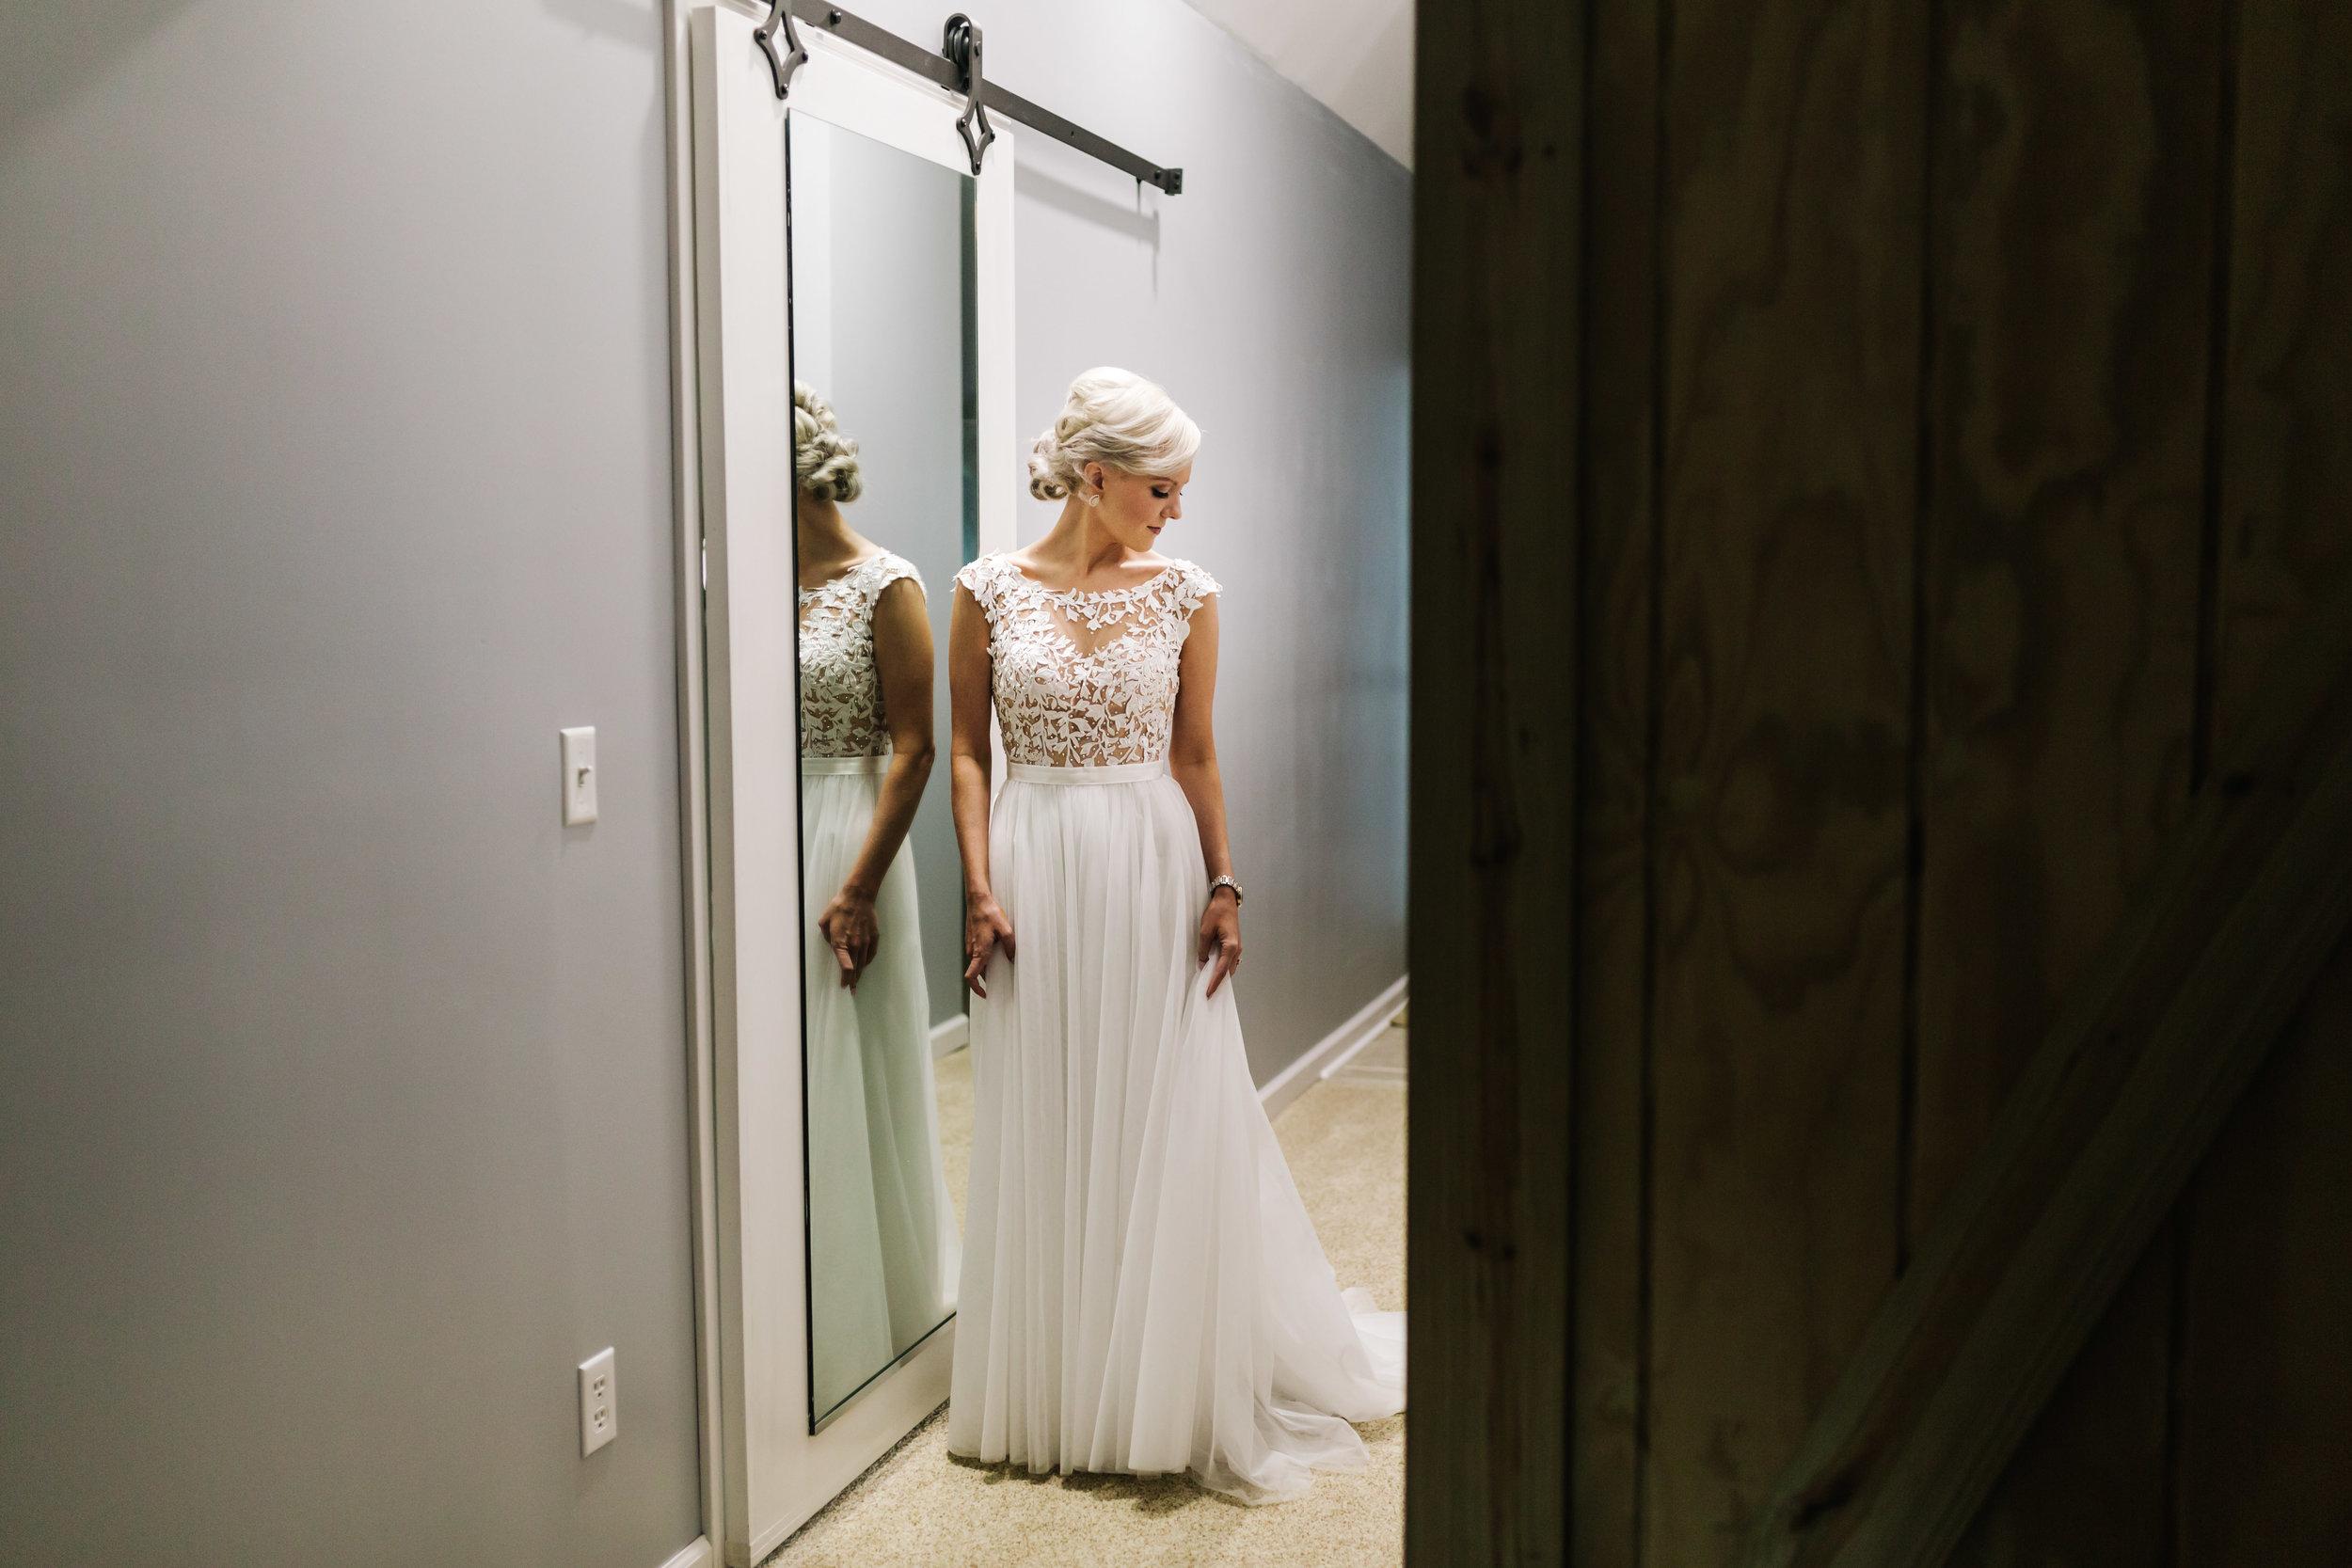 2018.09.02 Ray and Sarah Prizner Nashville TN Wedding FINALS-49.jpg